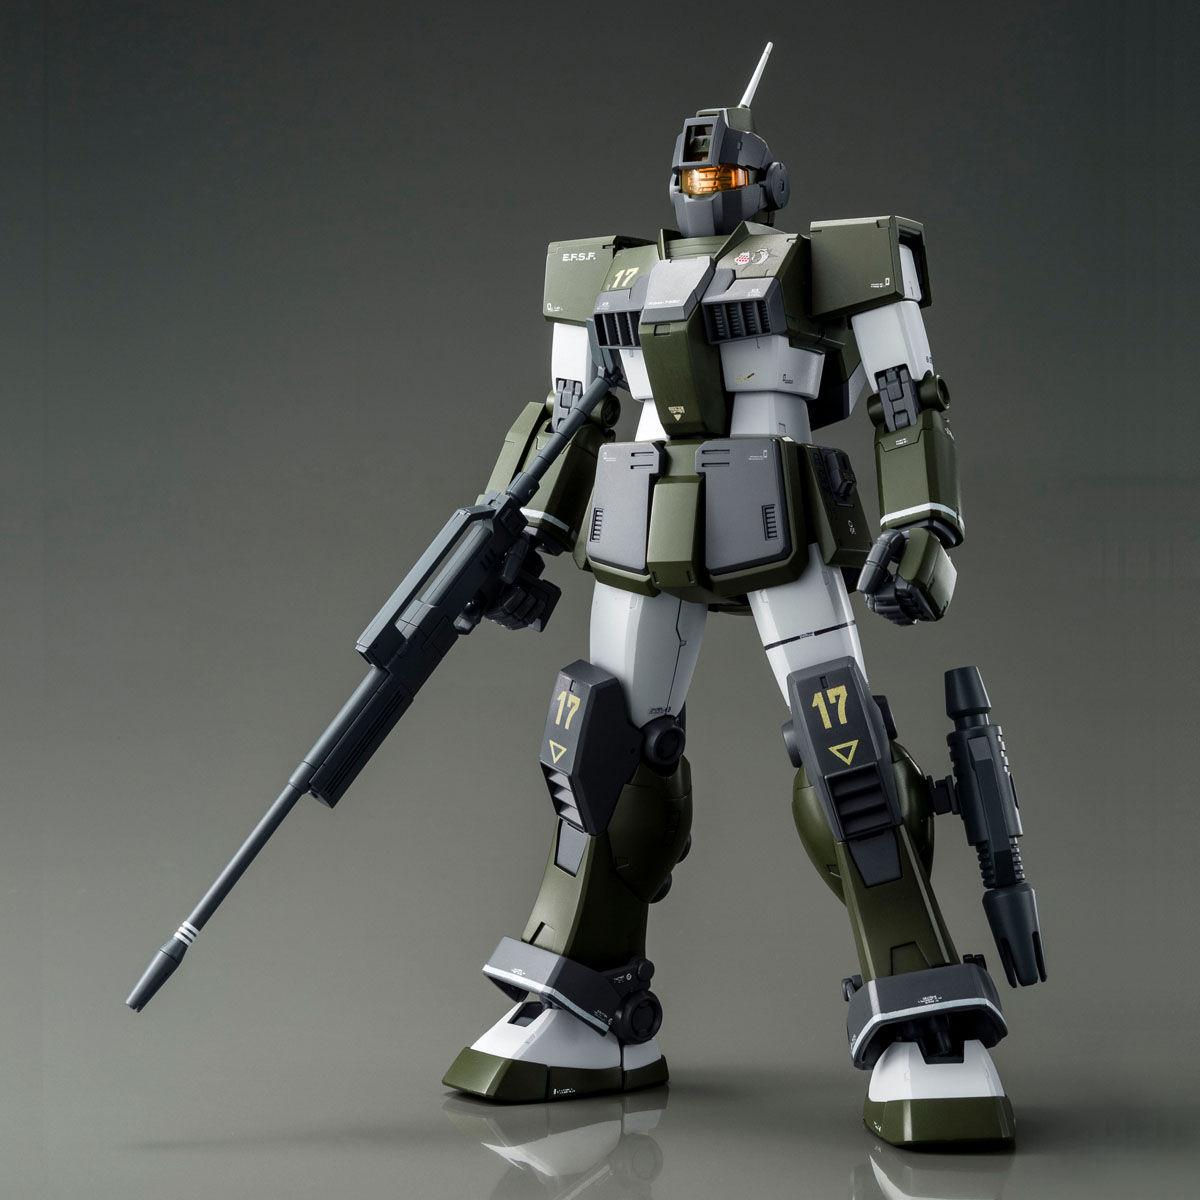 MG 1/100 RGM-79SC ジム・スナイパーカスタム (テネス・A・ユング機) [GM Sniper Custom Tenneth A. Jung's Custom]